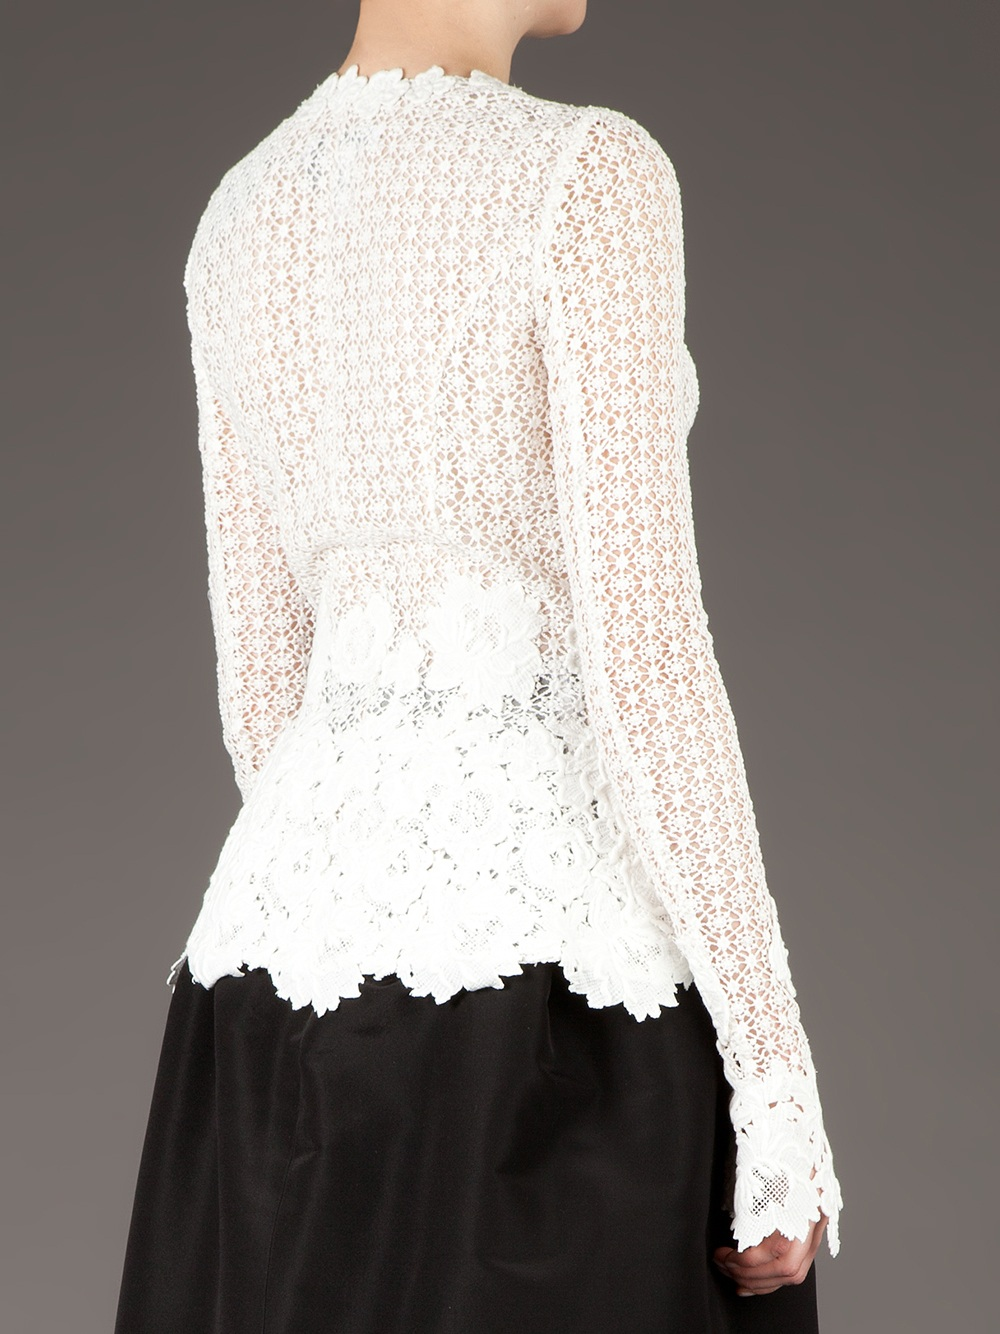 Oscar de la renta Floral Lace Cardigan in White | Lyst